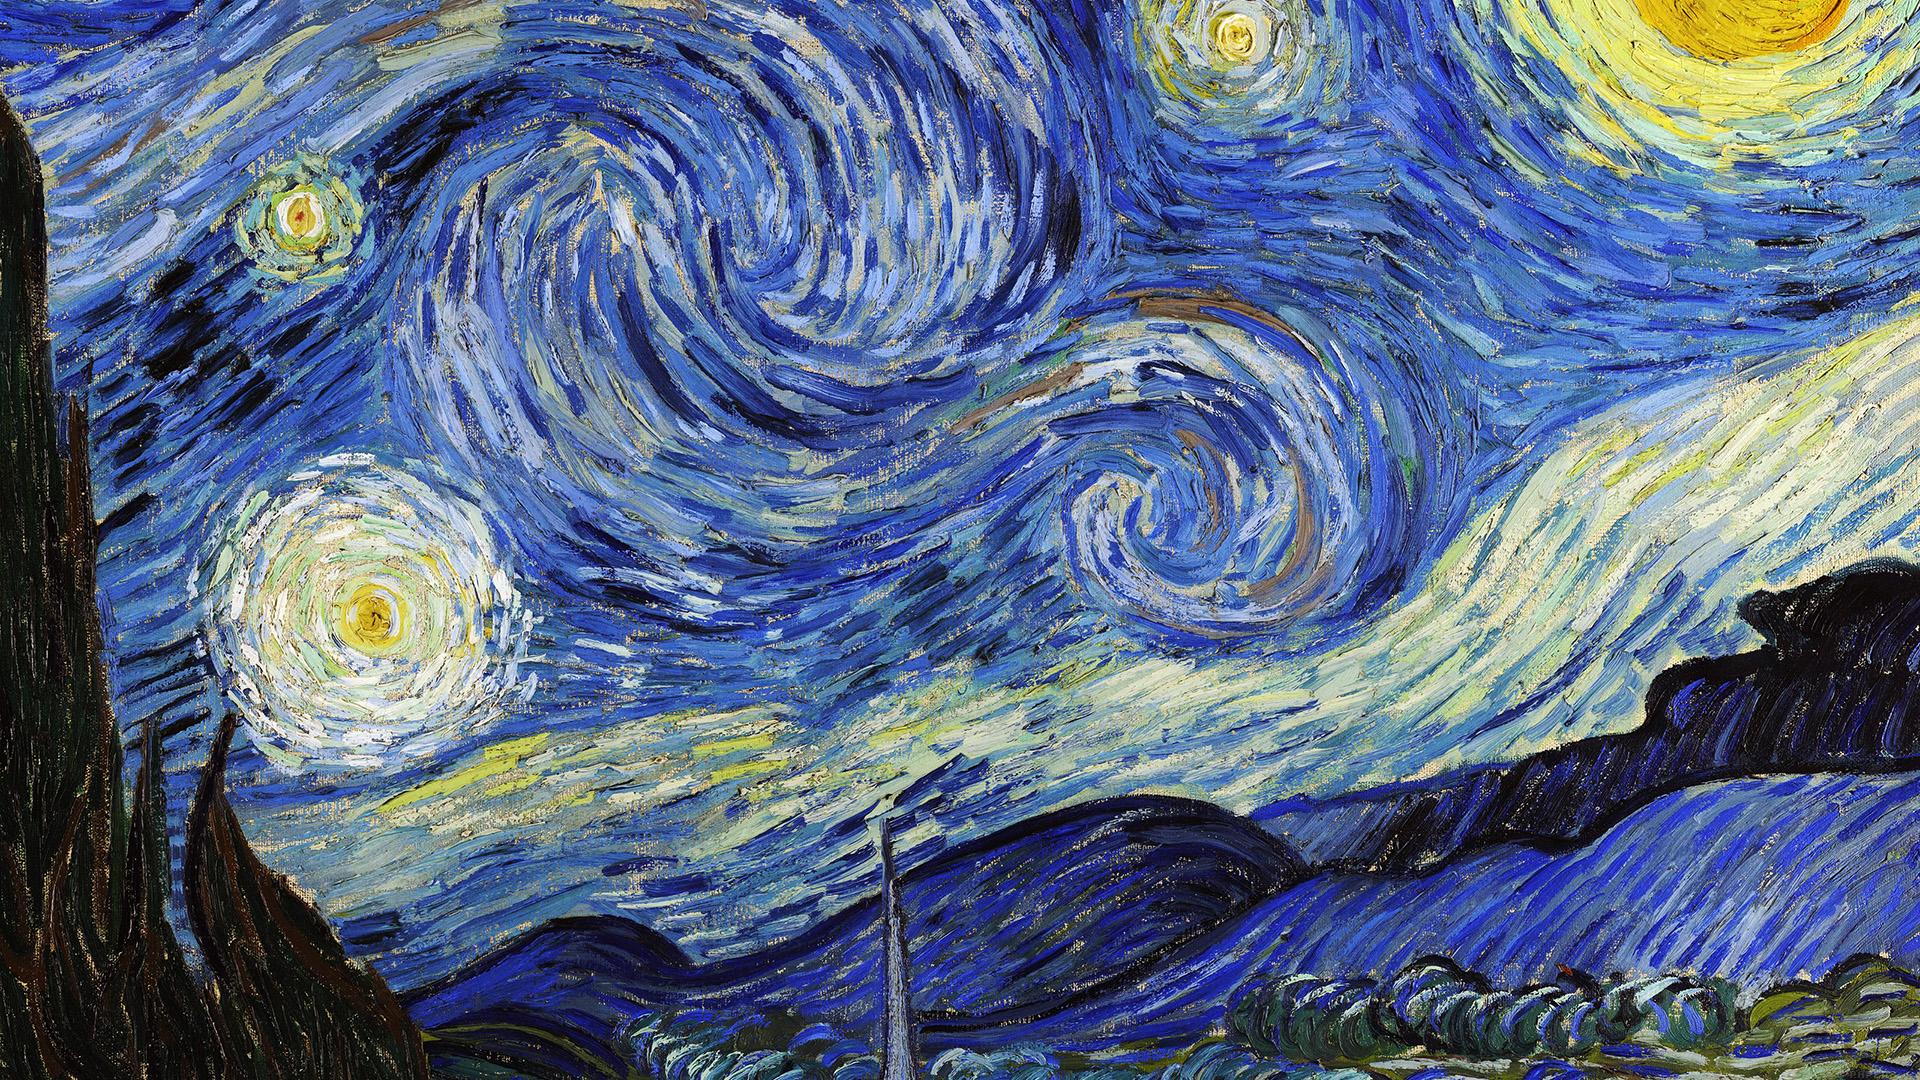 Fall Desktop Wallpaper Windows 7 Aj42 Vincent Van Gogh Starry Night Classic Painting Art